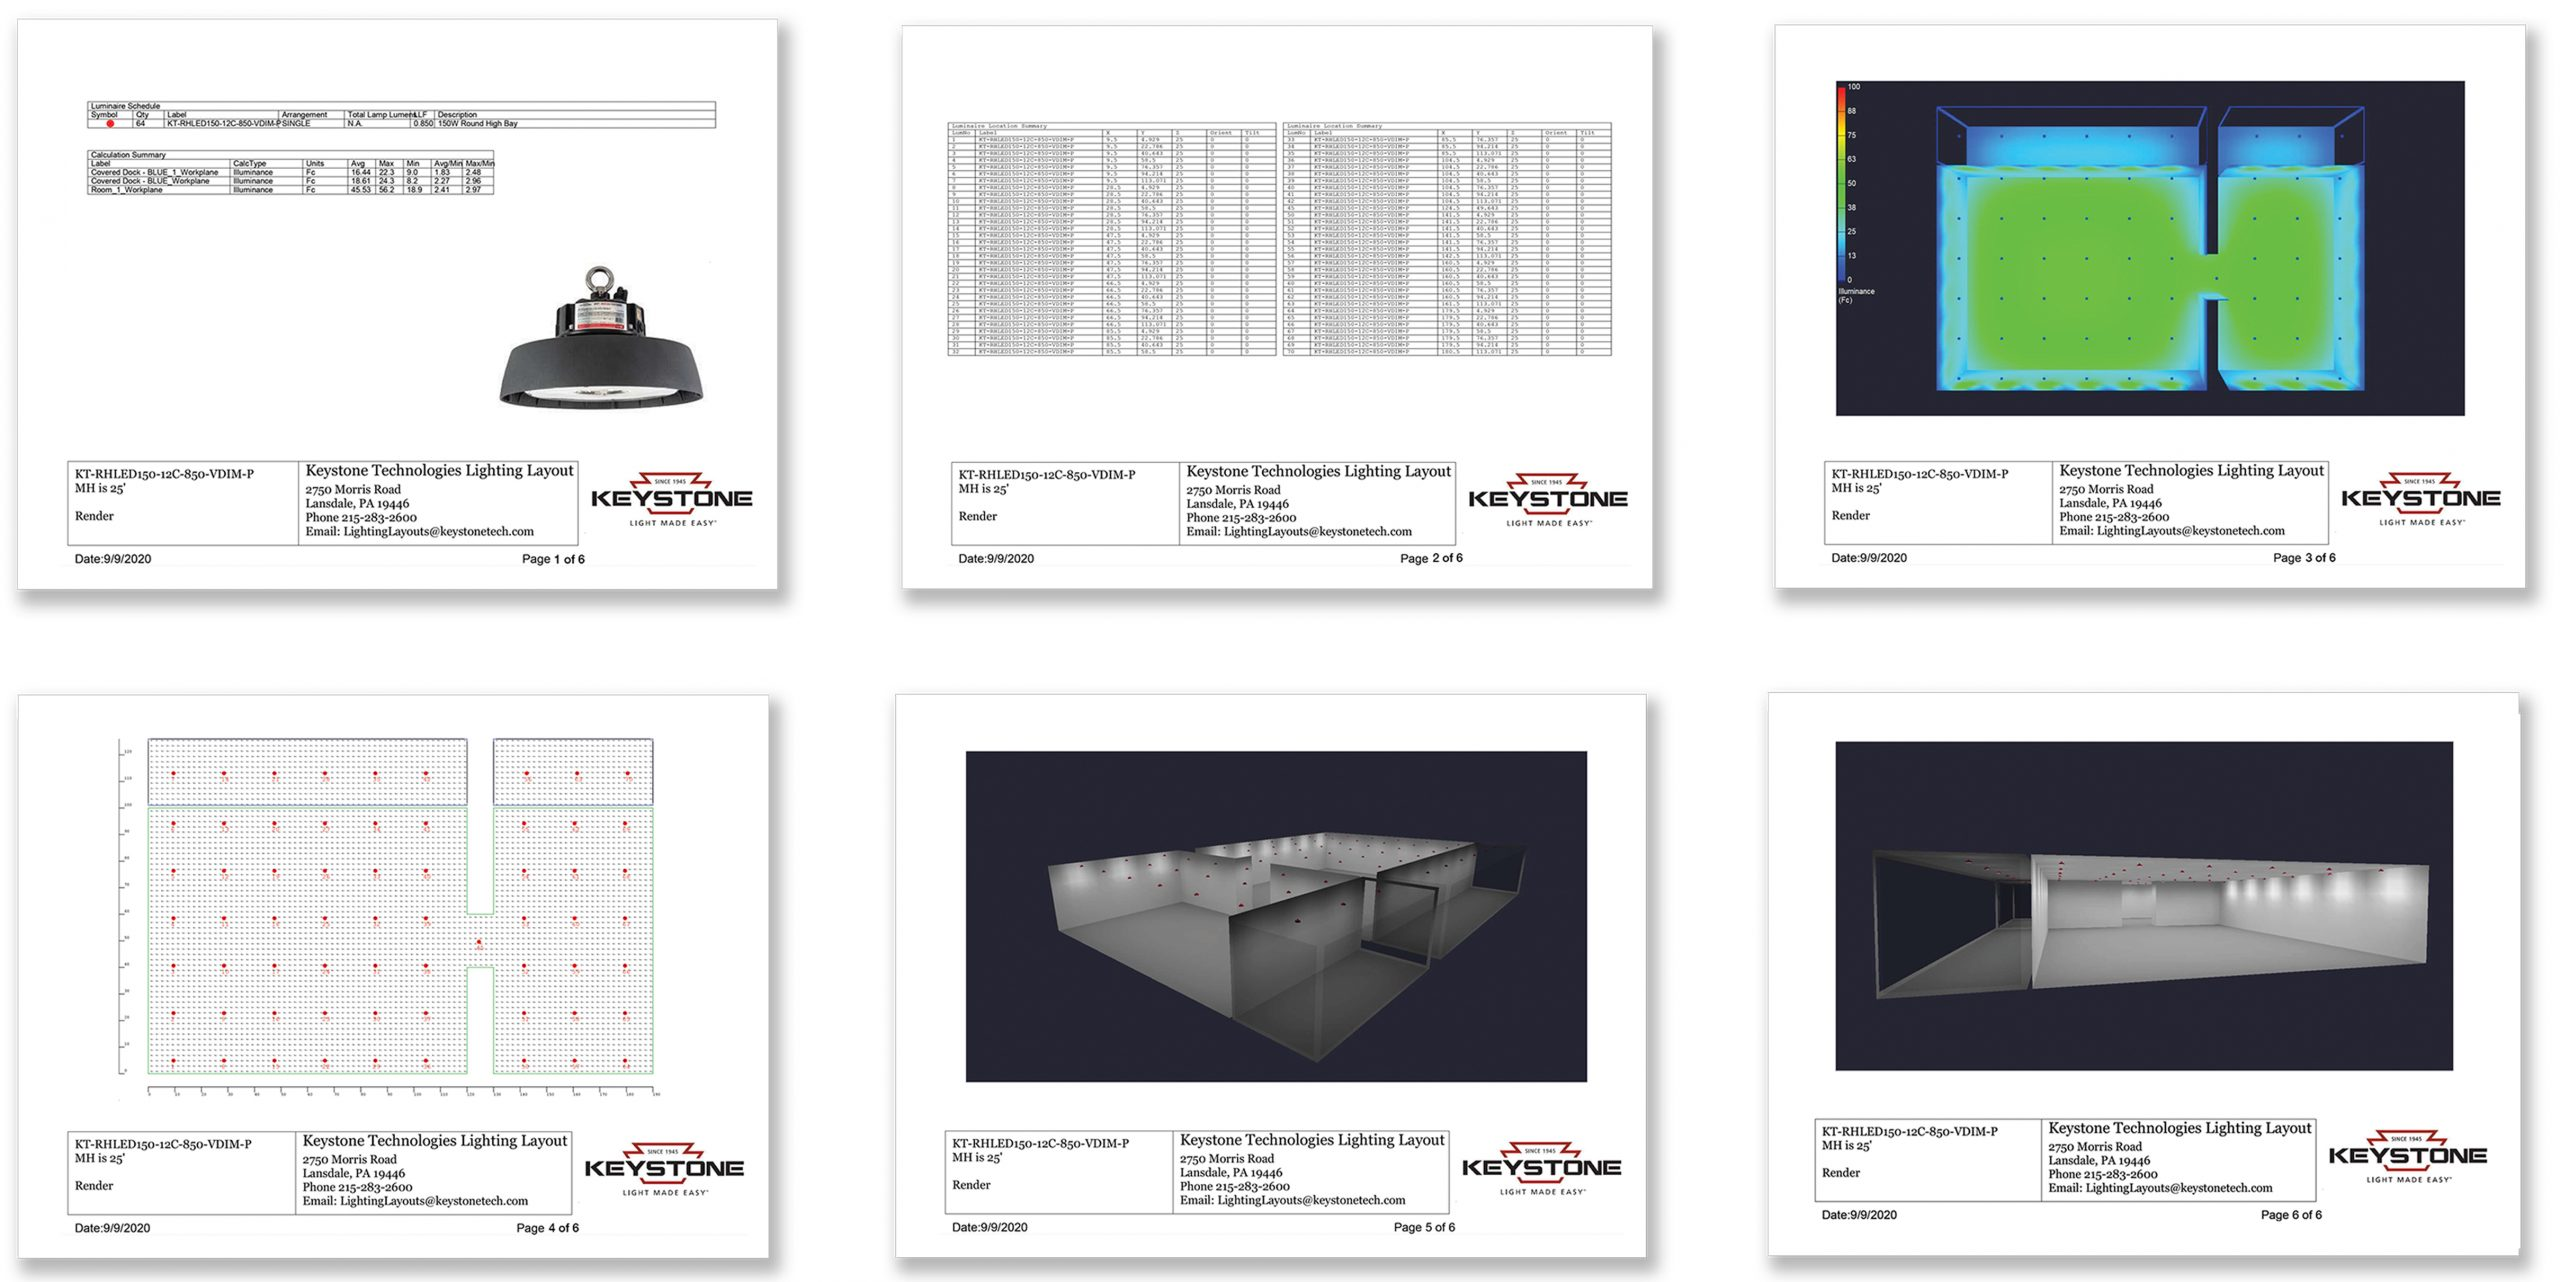 lighting layout keystone technologies